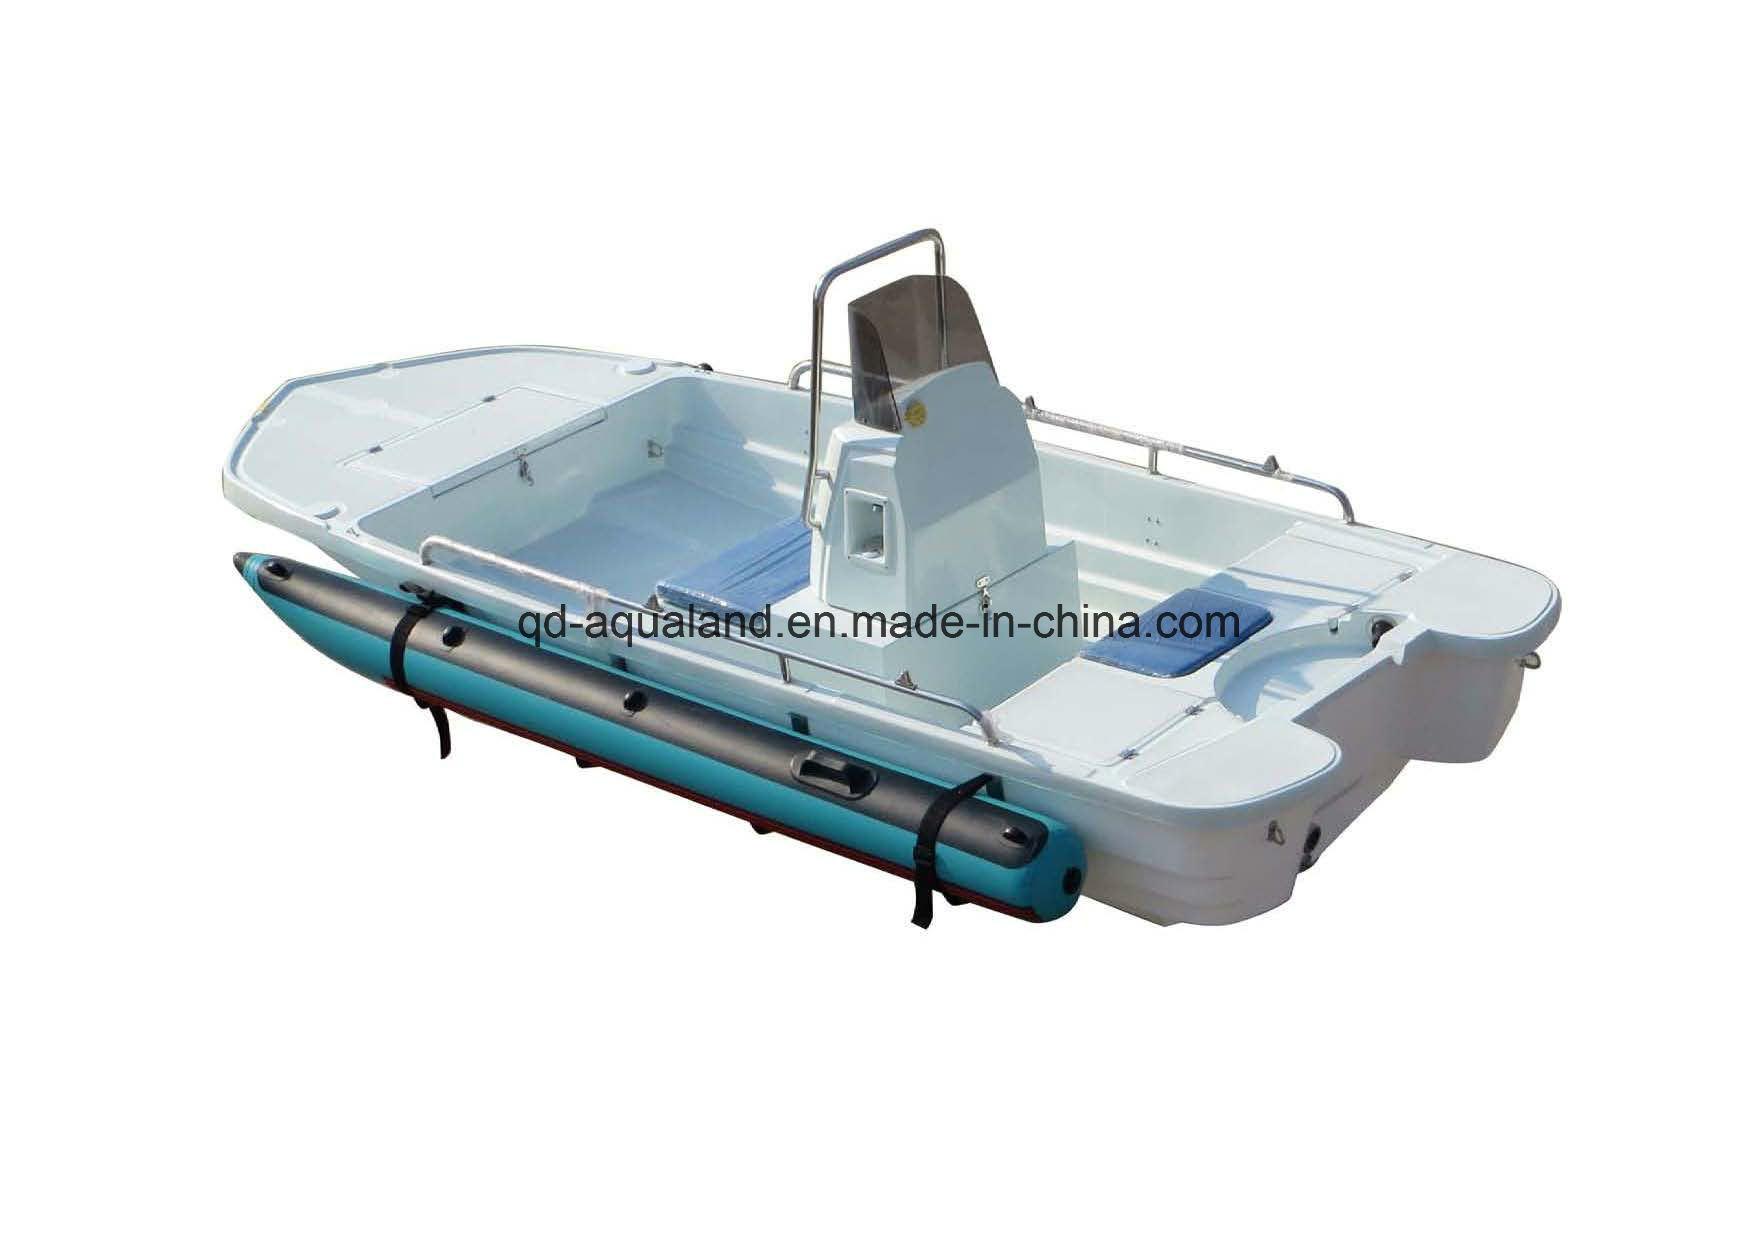 China aqualand 13feet 4m fiberglass speed boat fishing for Portable fishing boat